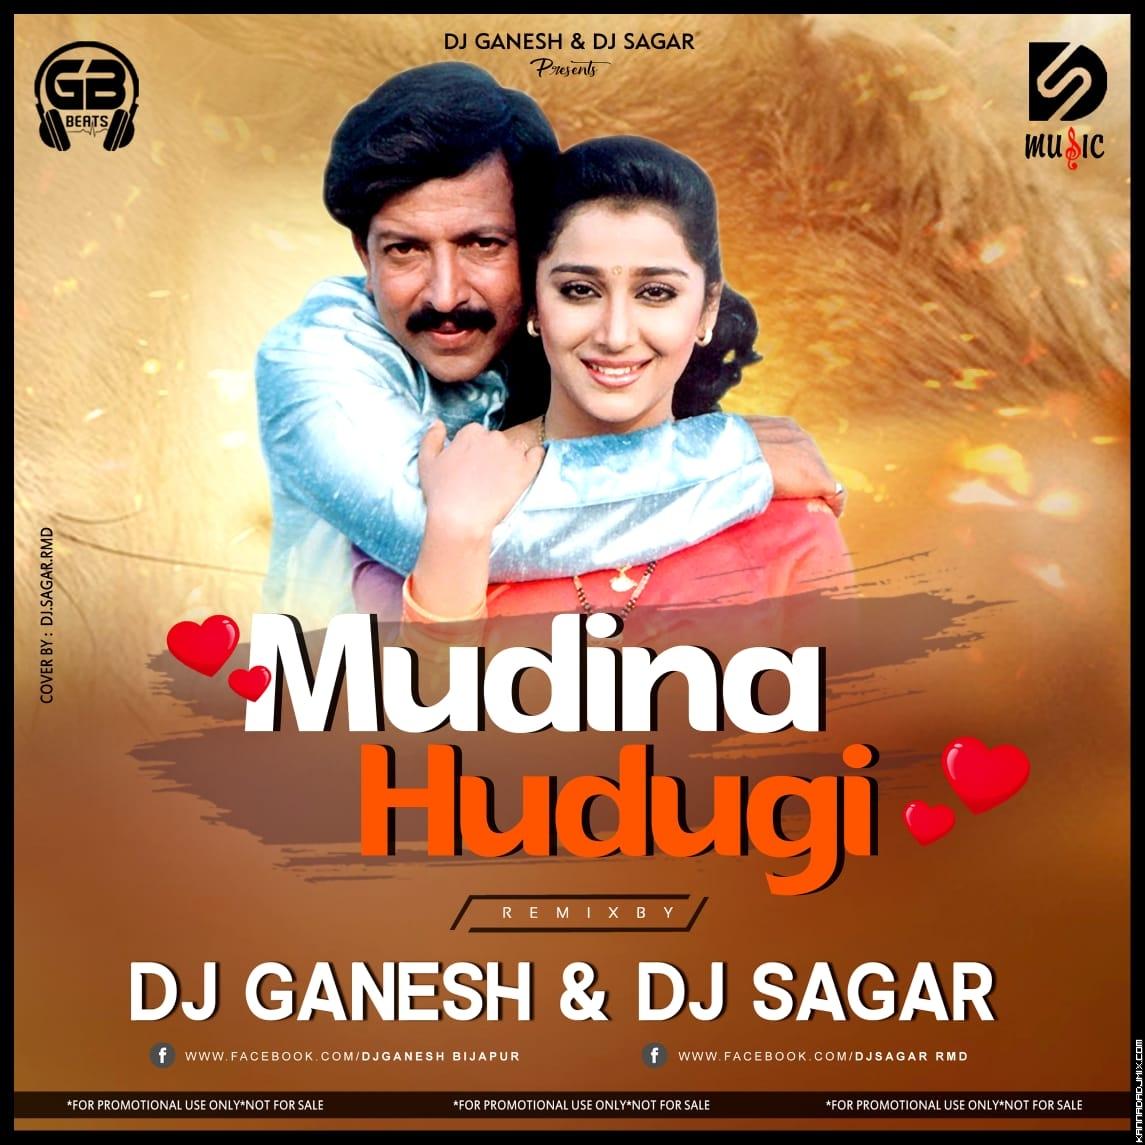 MUDDINA HUDUGI CHANDA REMIX DJ GANESH [BIJPAUR] AND DJ SAGAR RMD.mp3